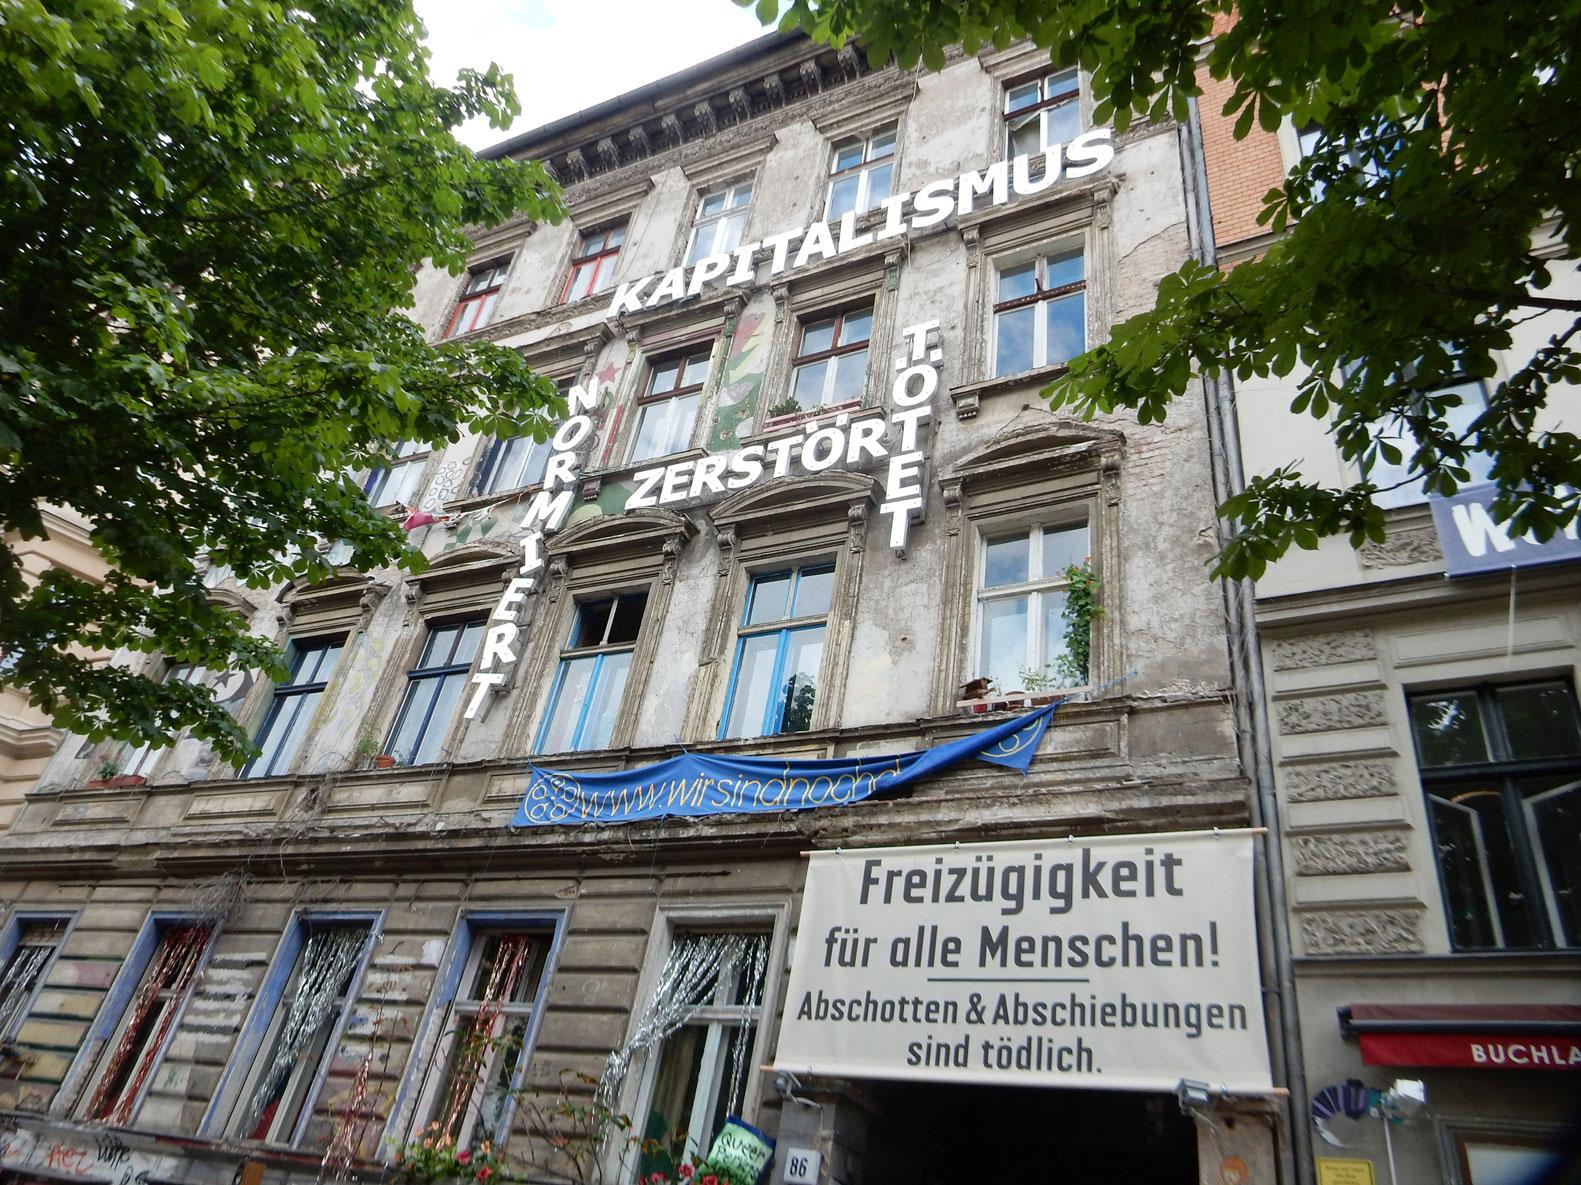 radtour durch berlin prenzlauer berg unterwegs in berlin. Black Bedroom Furniture Sets. Home Design Ideas